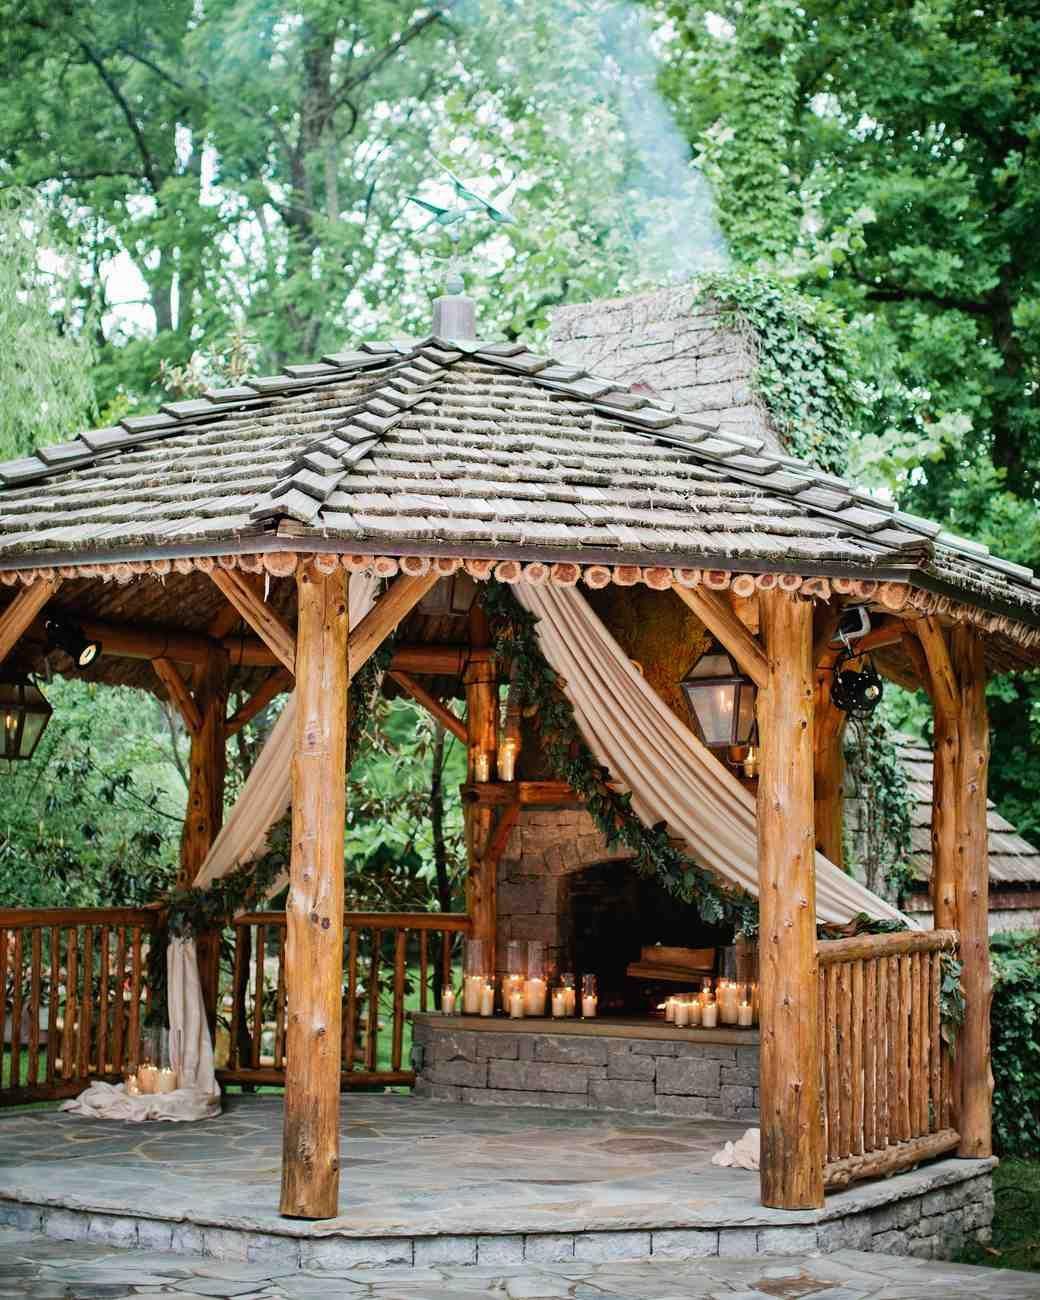 A Tennessee Wedding At The Couple S Log Cabin Home Gazebo Modern Gazebo Log Cabin Rustic